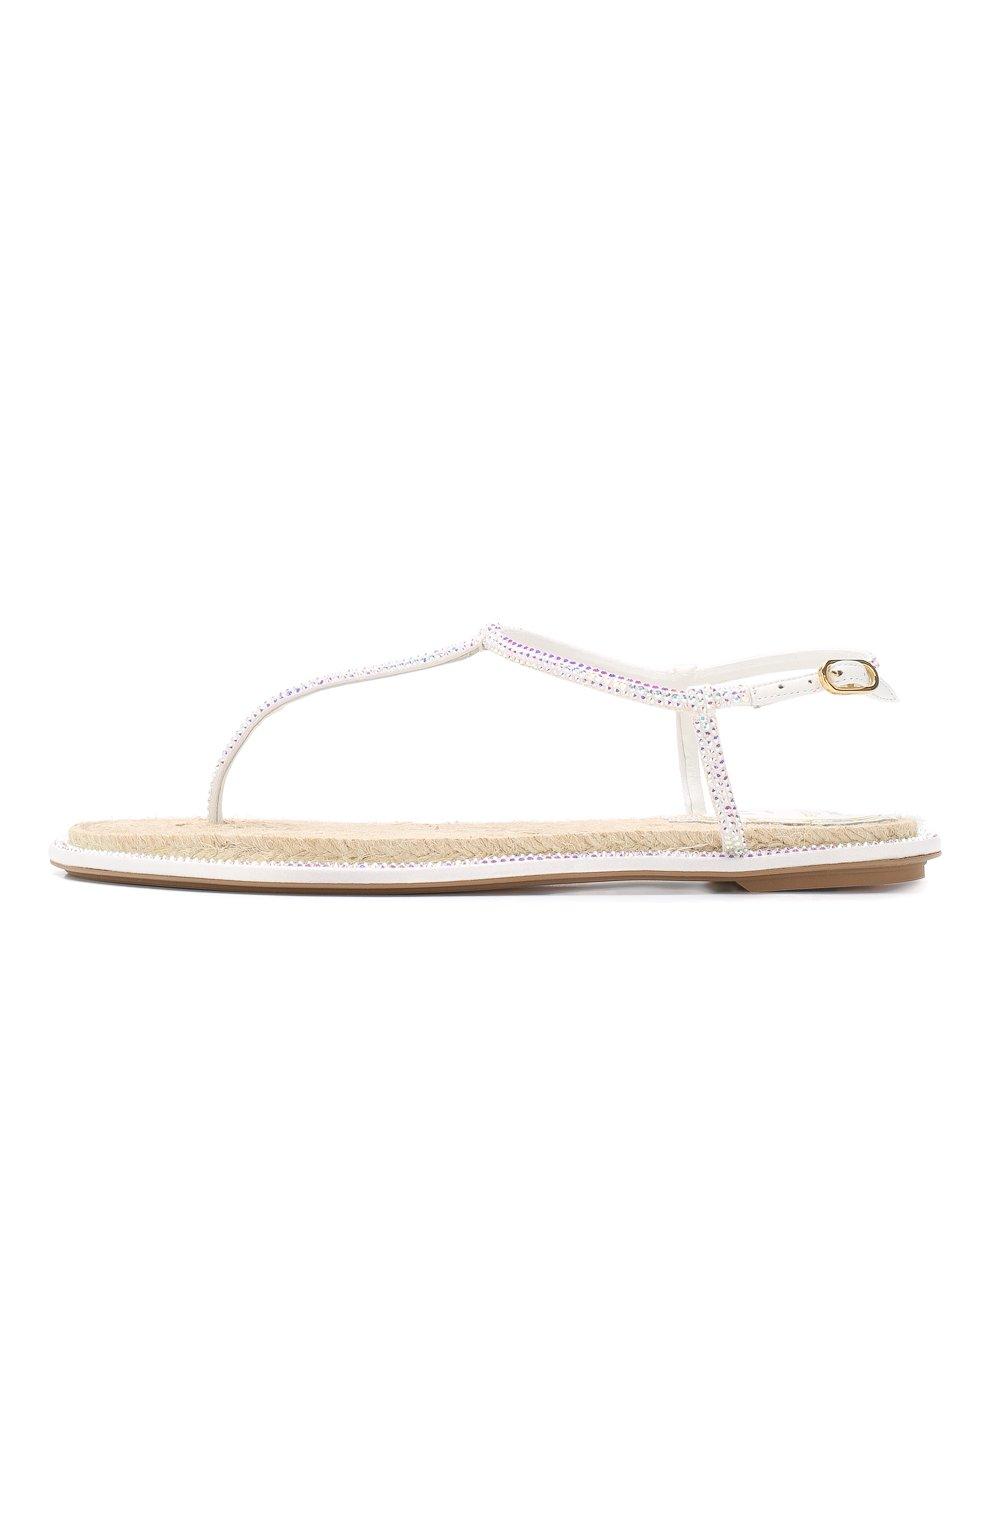 Кожаные сандалии Diana Rene Caovilla белые | Фото №3